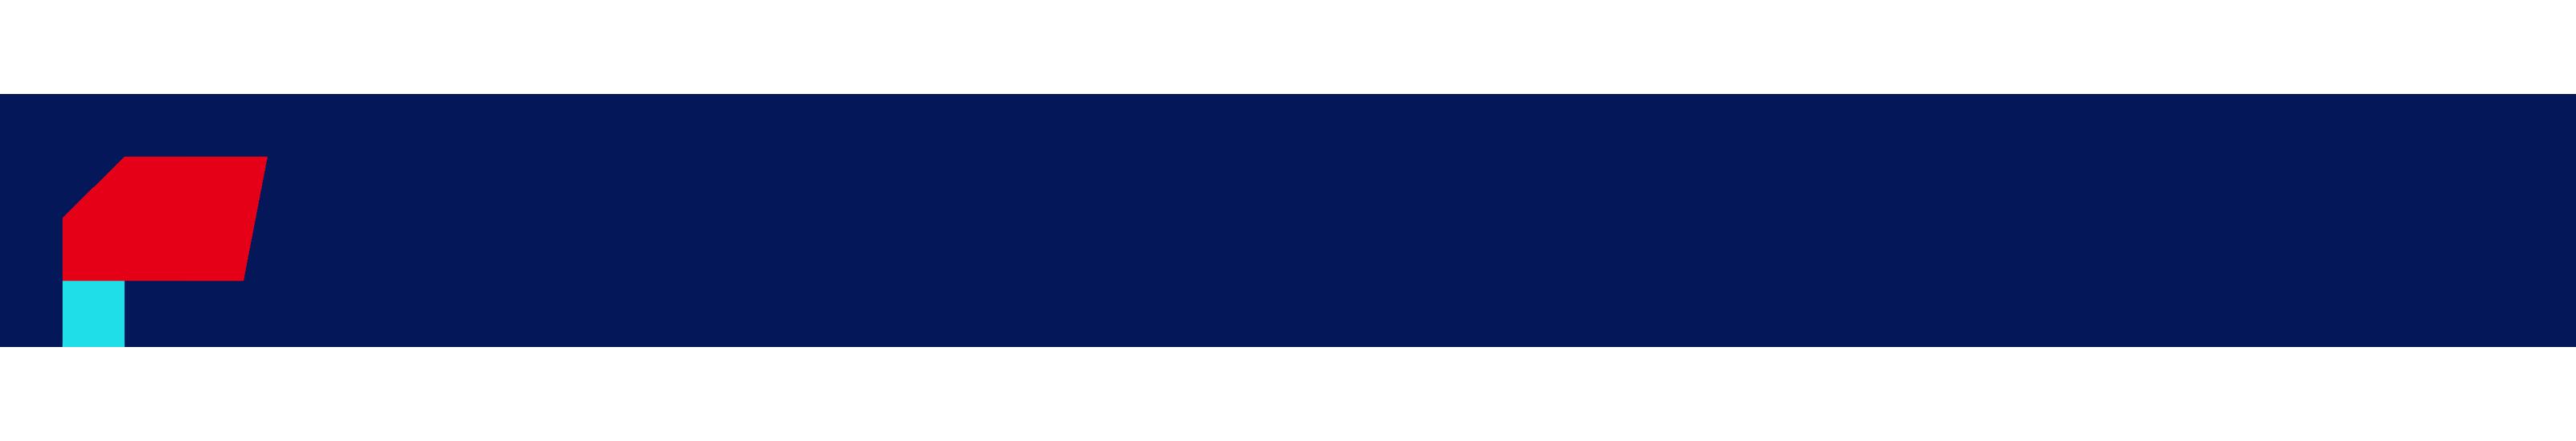 ac_logo_horizontal2